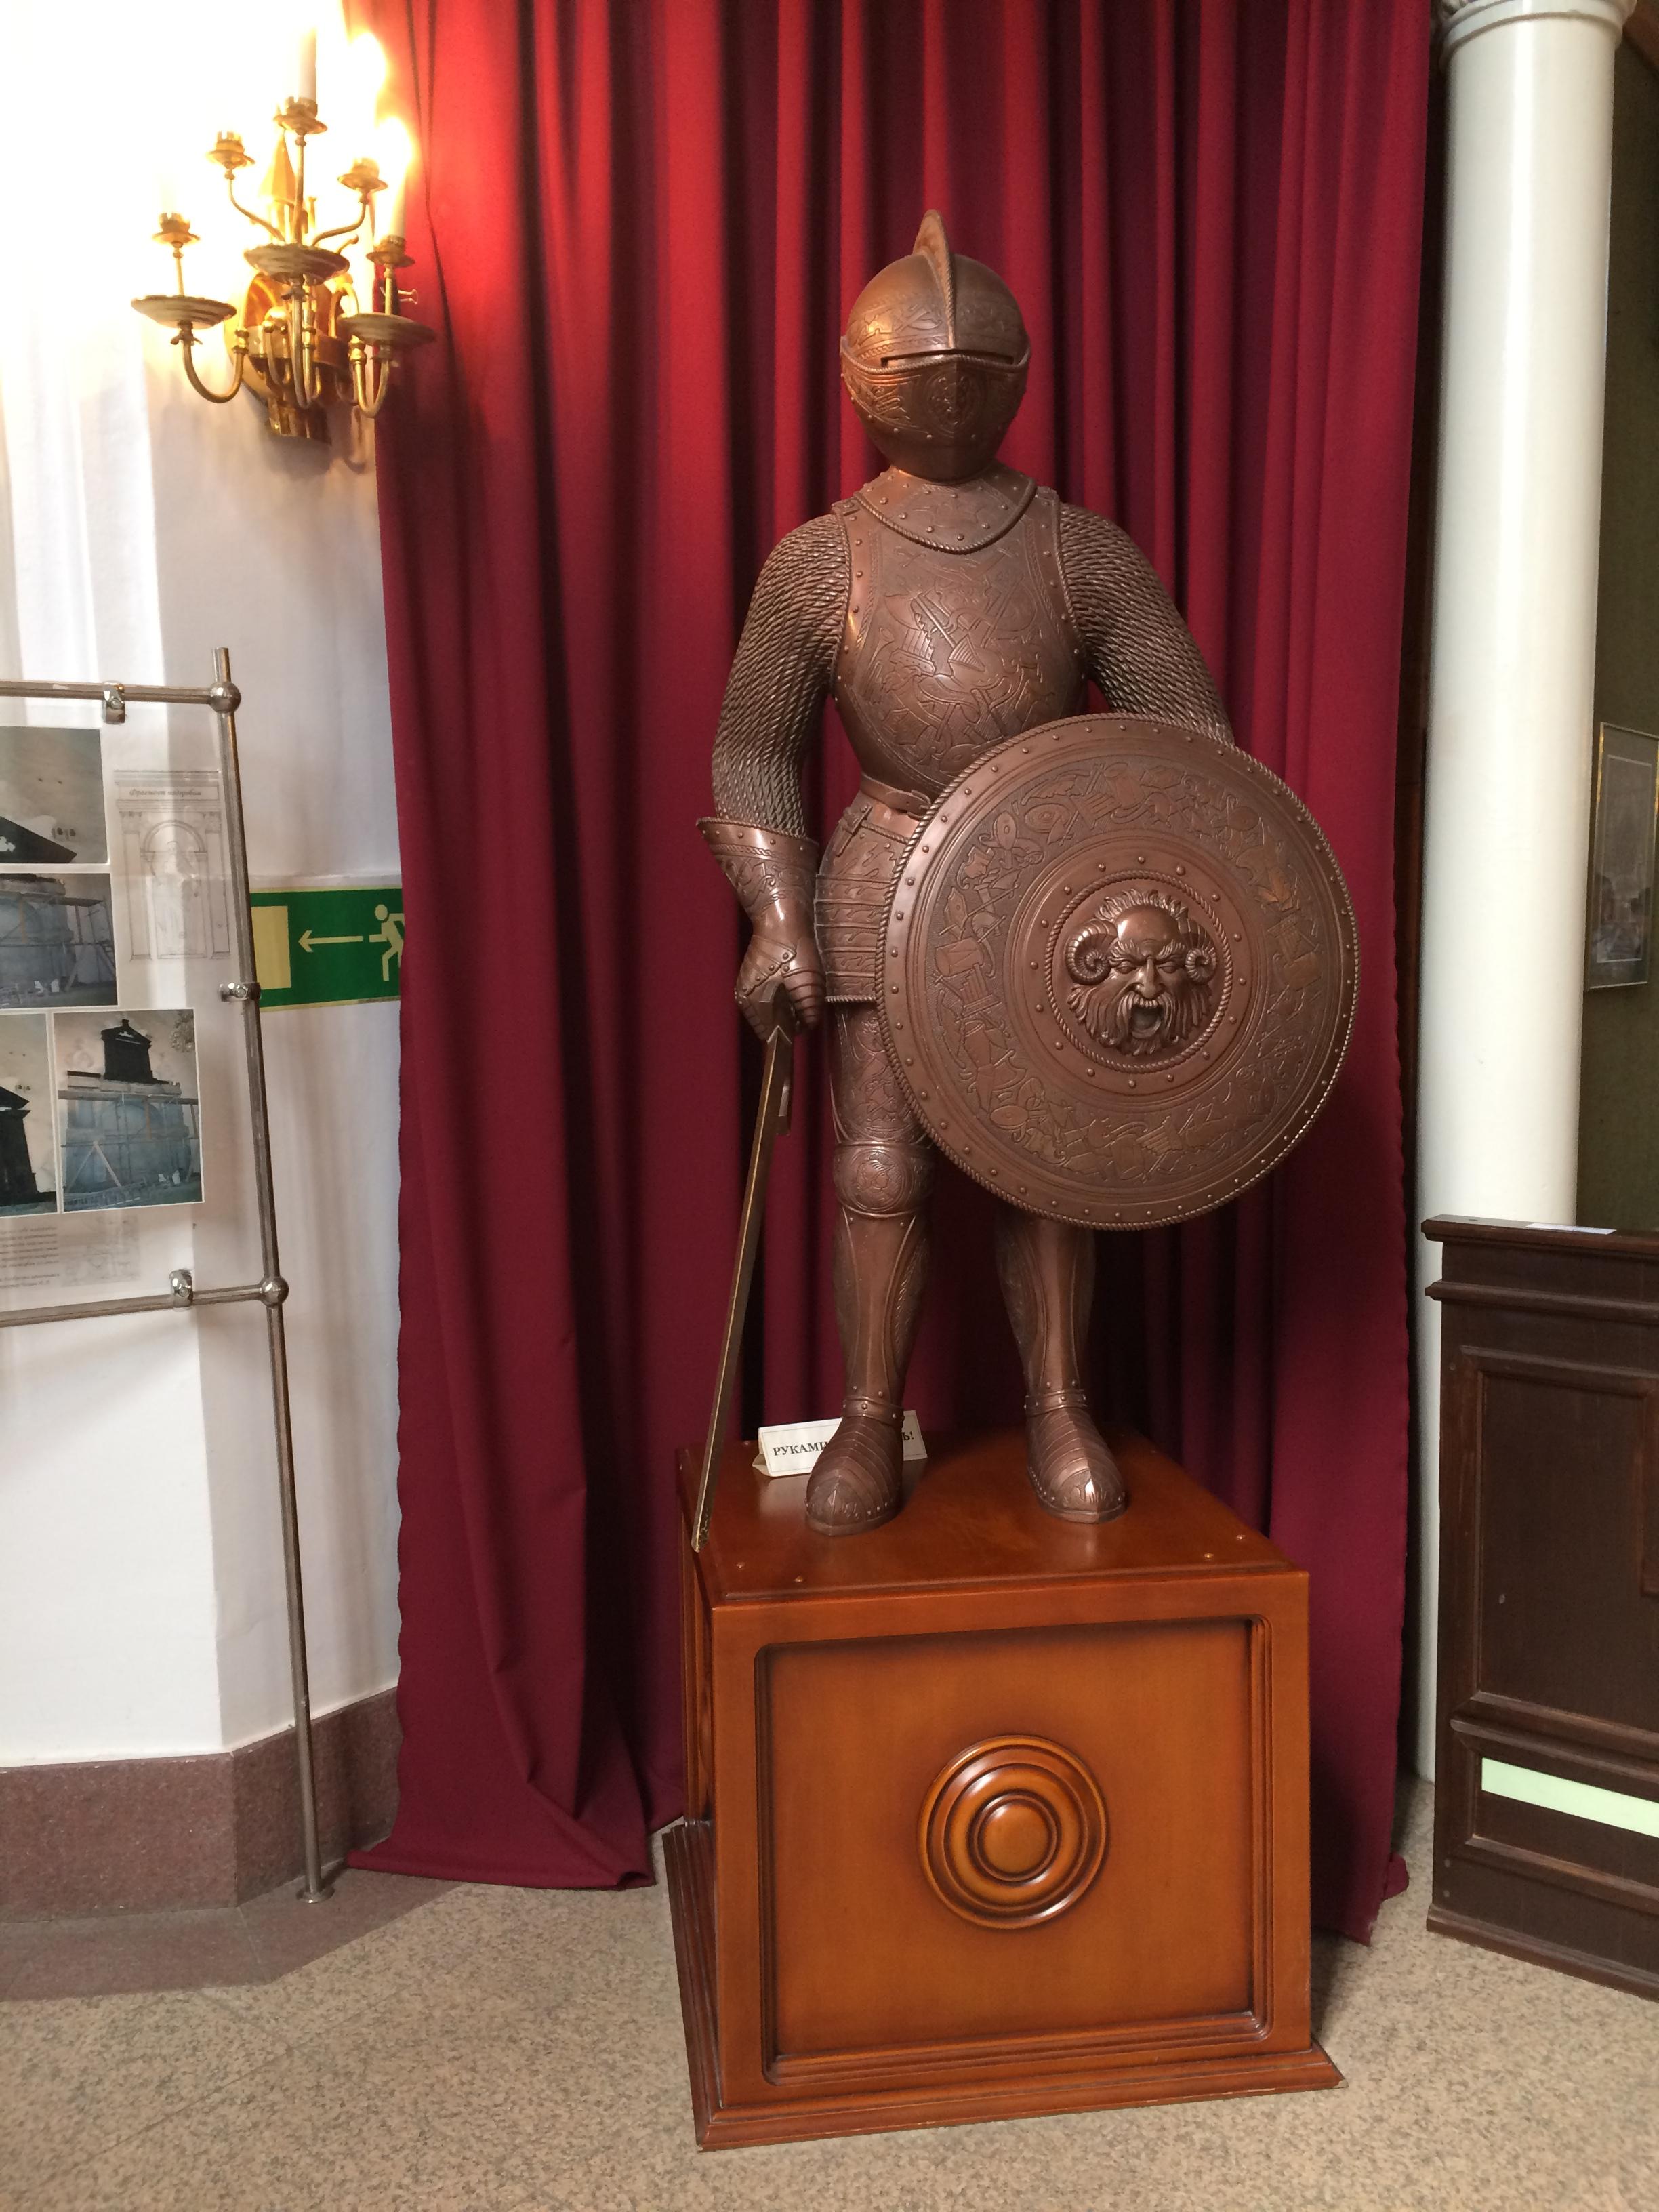 Калининград. Рыцарь. Блиц: музейный экспонат